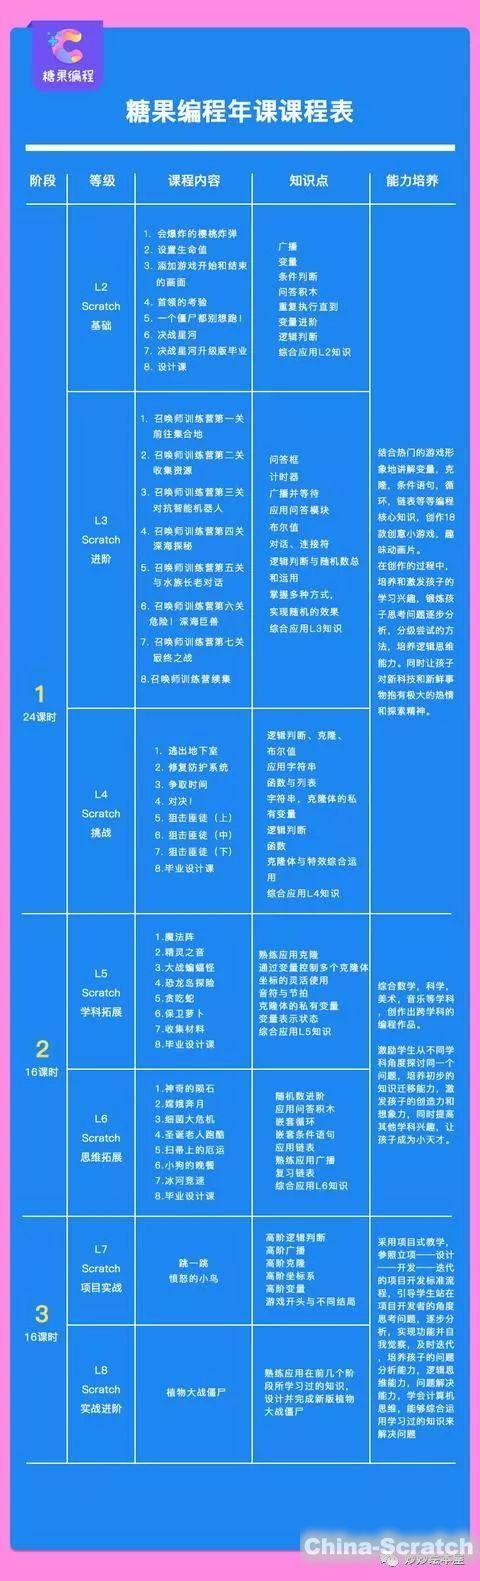 https://cdn.china-scratch.com/timg/190813/132ZW942-10.jpg